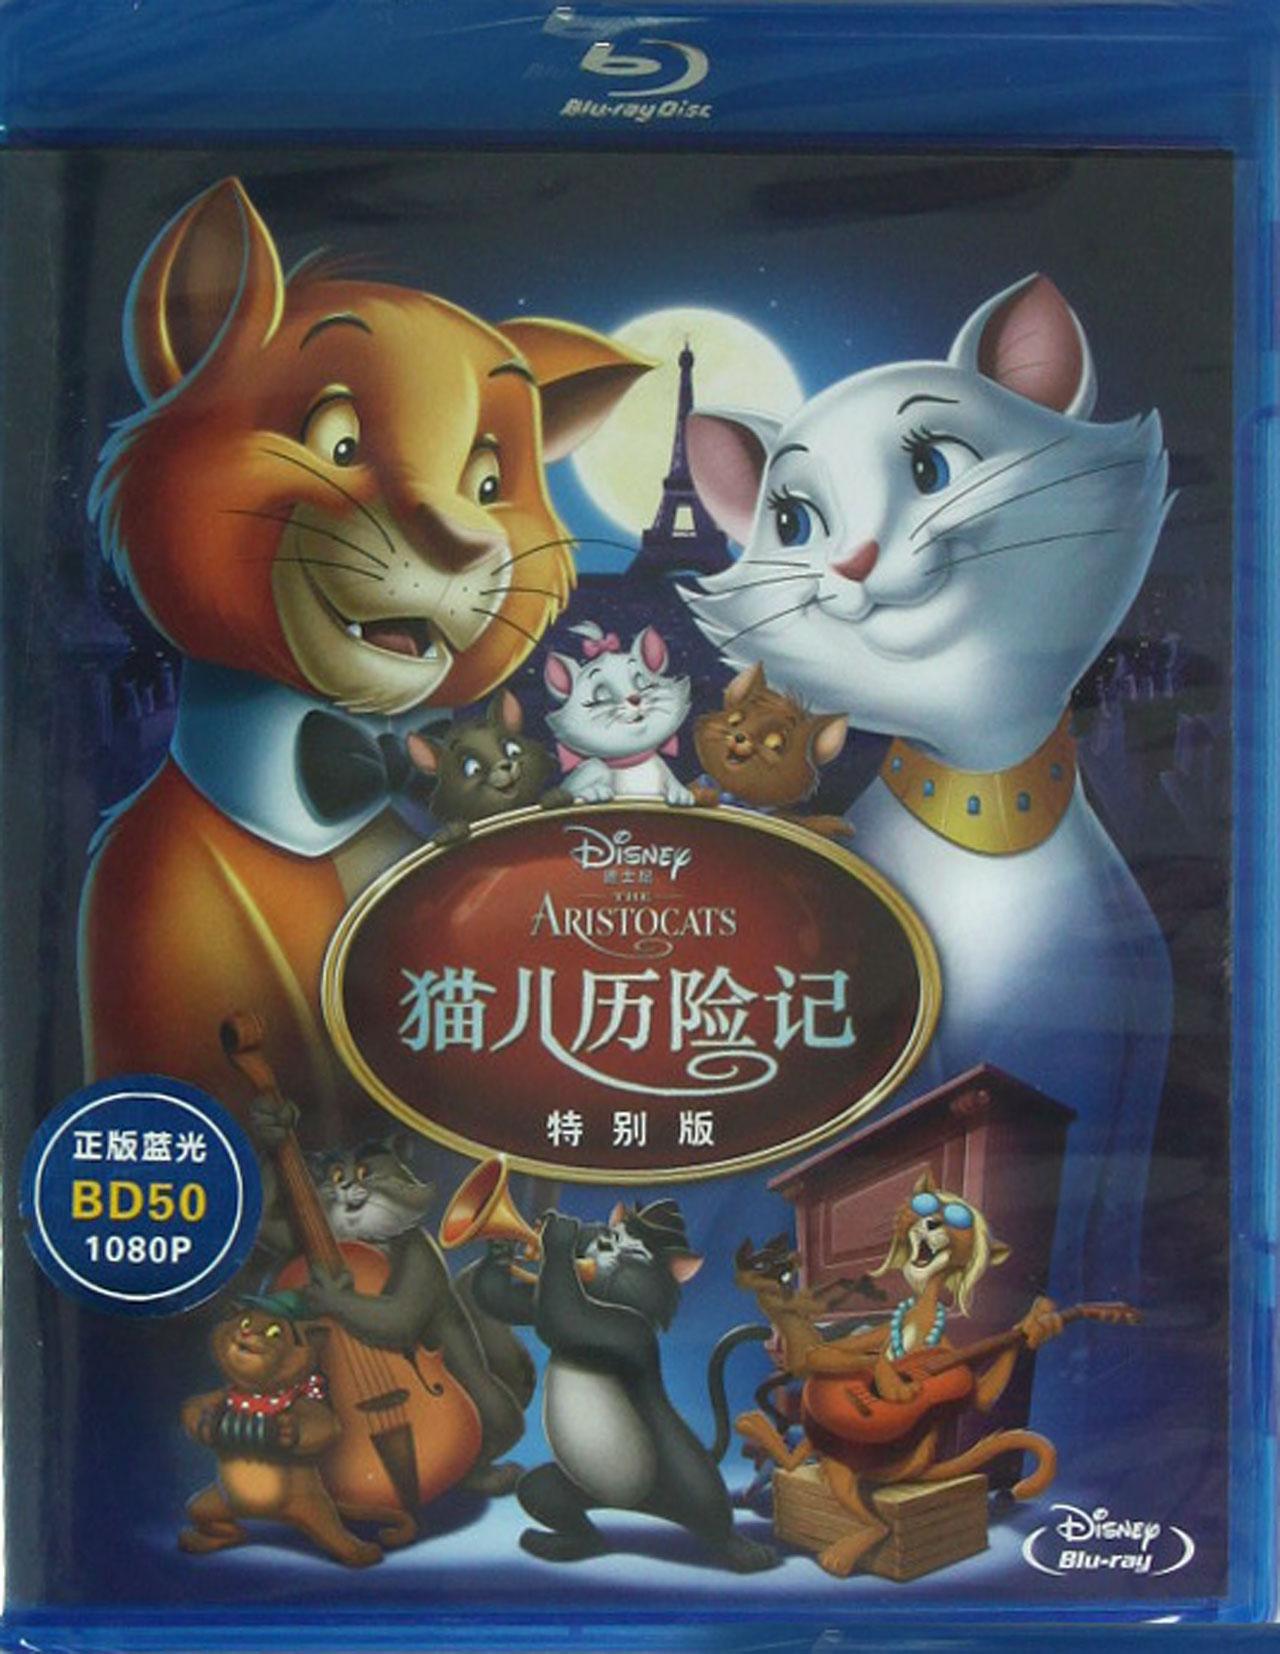 bd(蓝光)猫儿历险记特别版